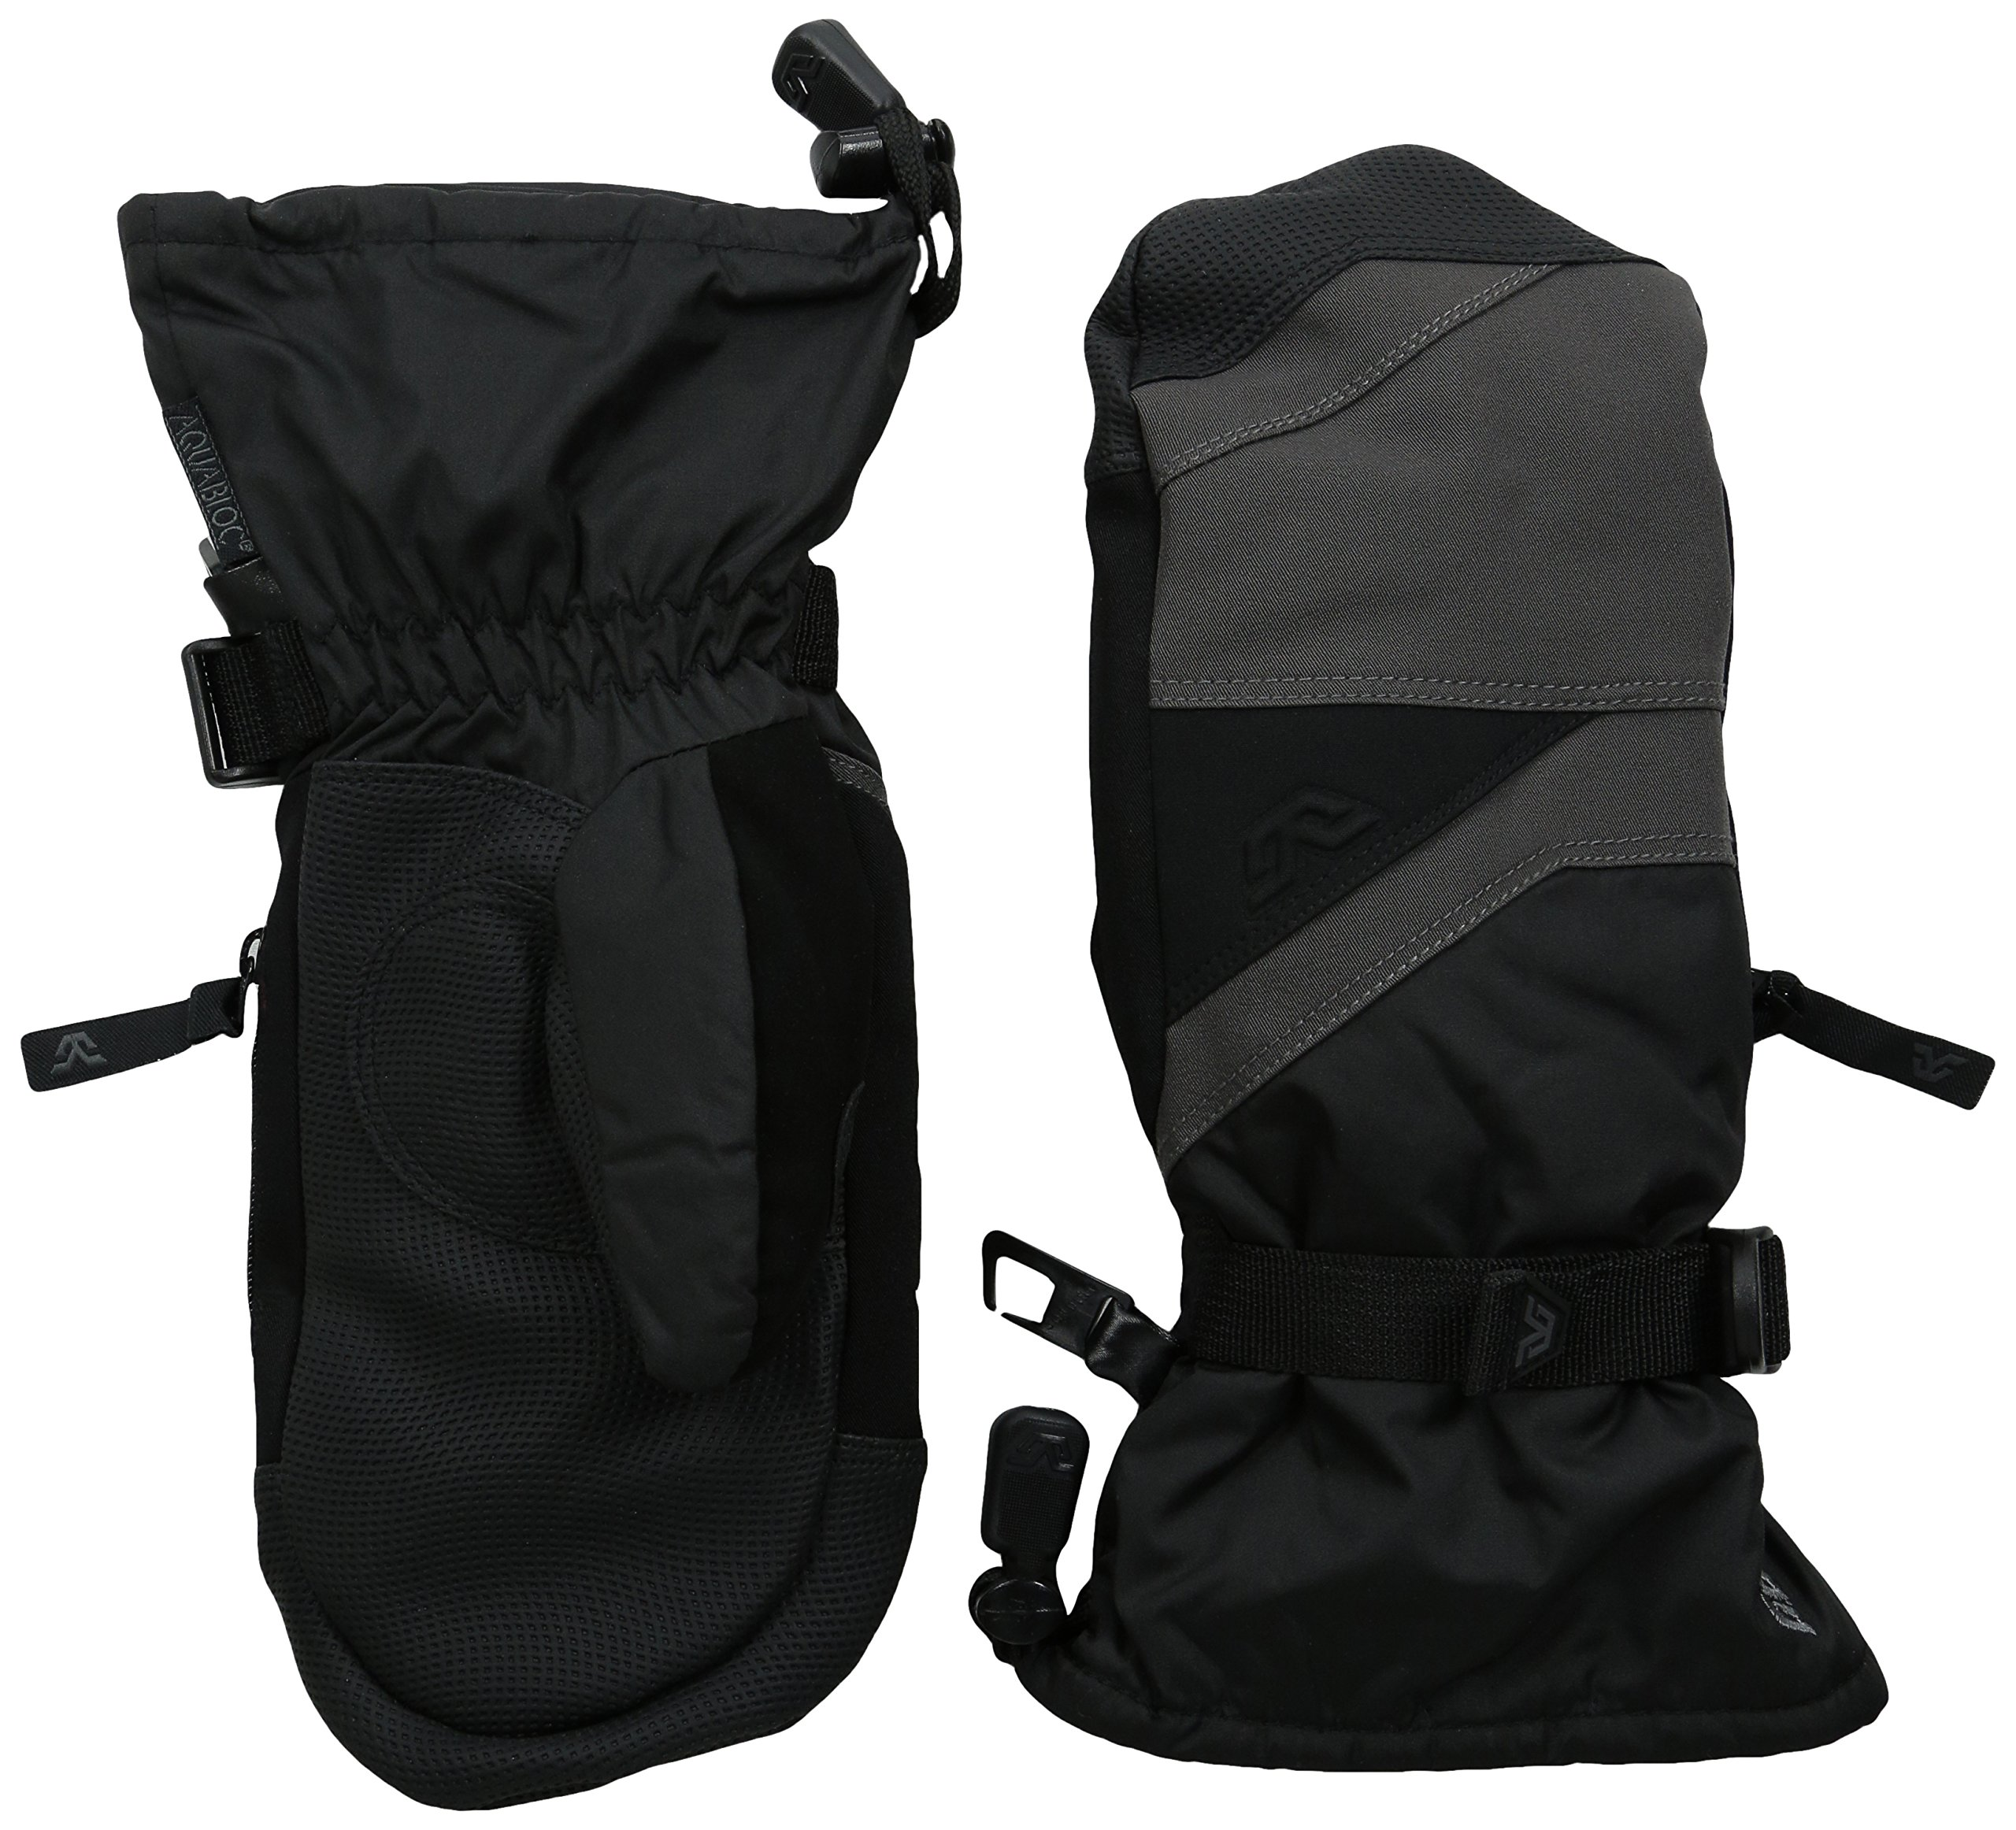 Gordini Little Kids Junior's Stomp Iii Waterproof Insulated Mittens, Gun Metal Black, X-Small